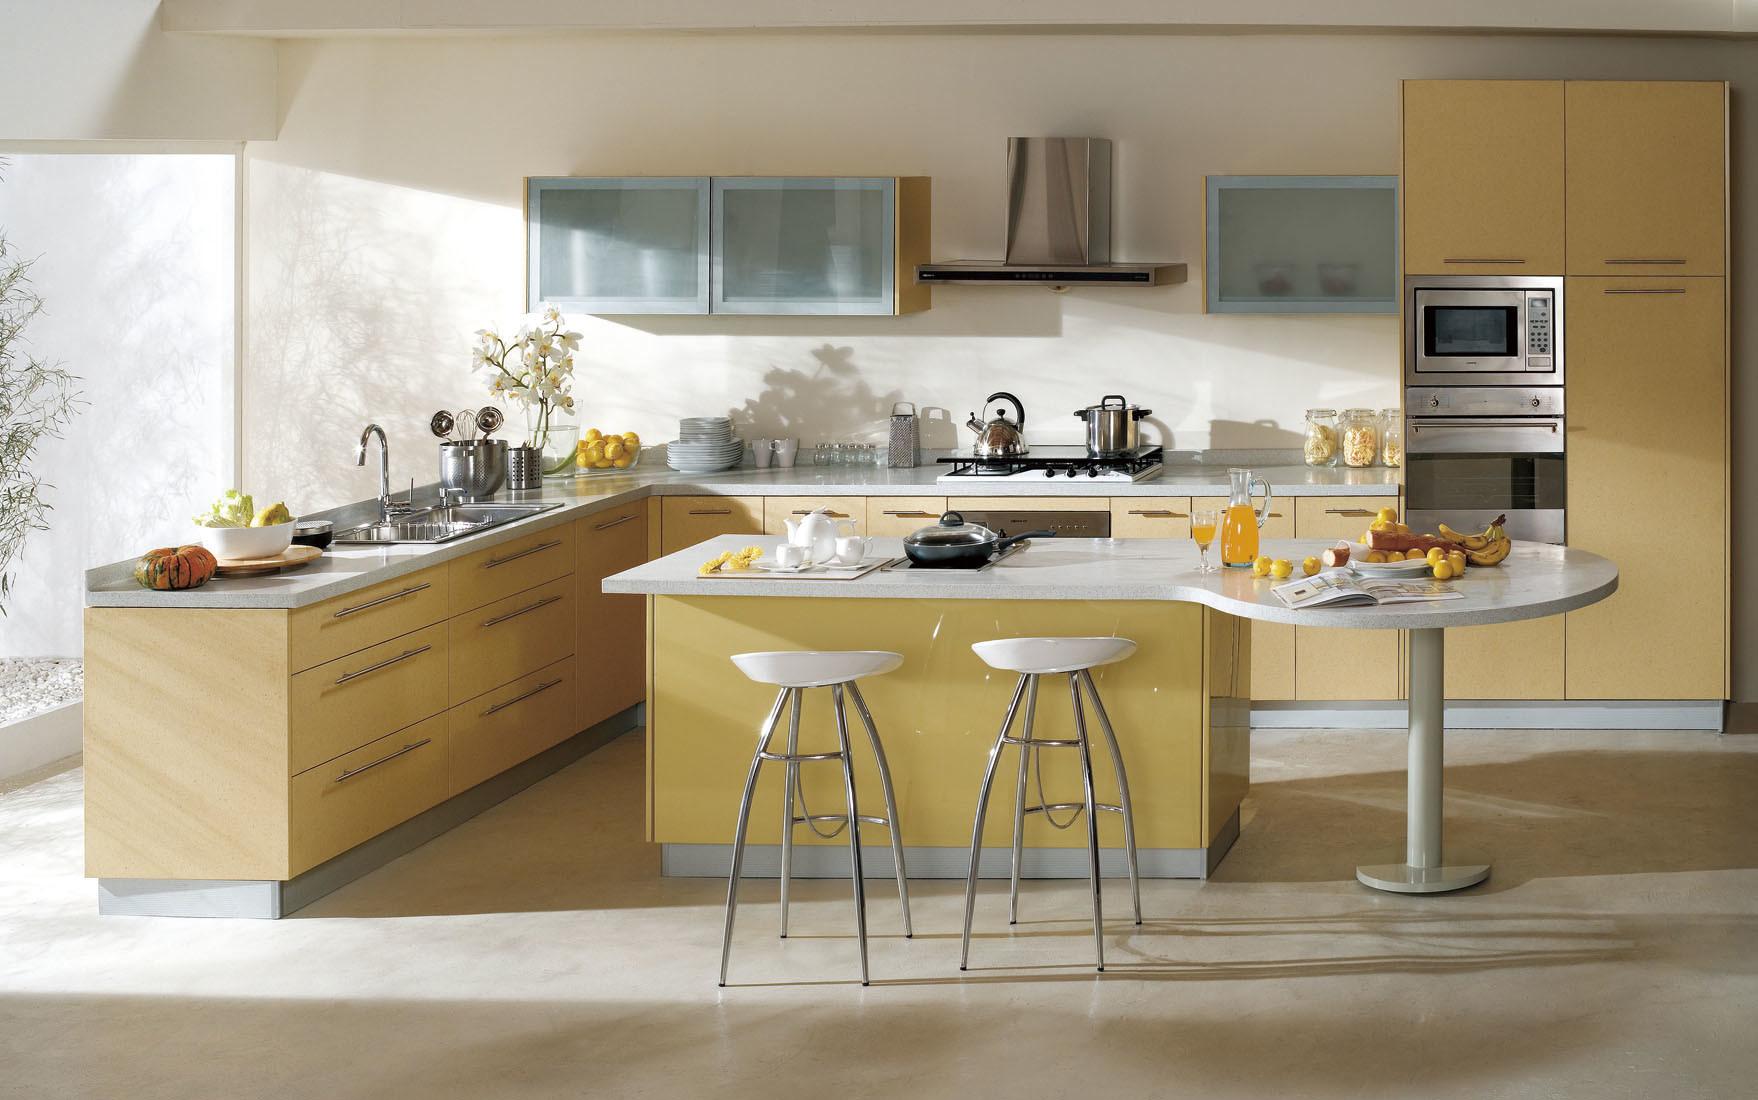 Cabina de cocina muebles modernos de la cocina smt 9977 for Gabinetes cocina modernos